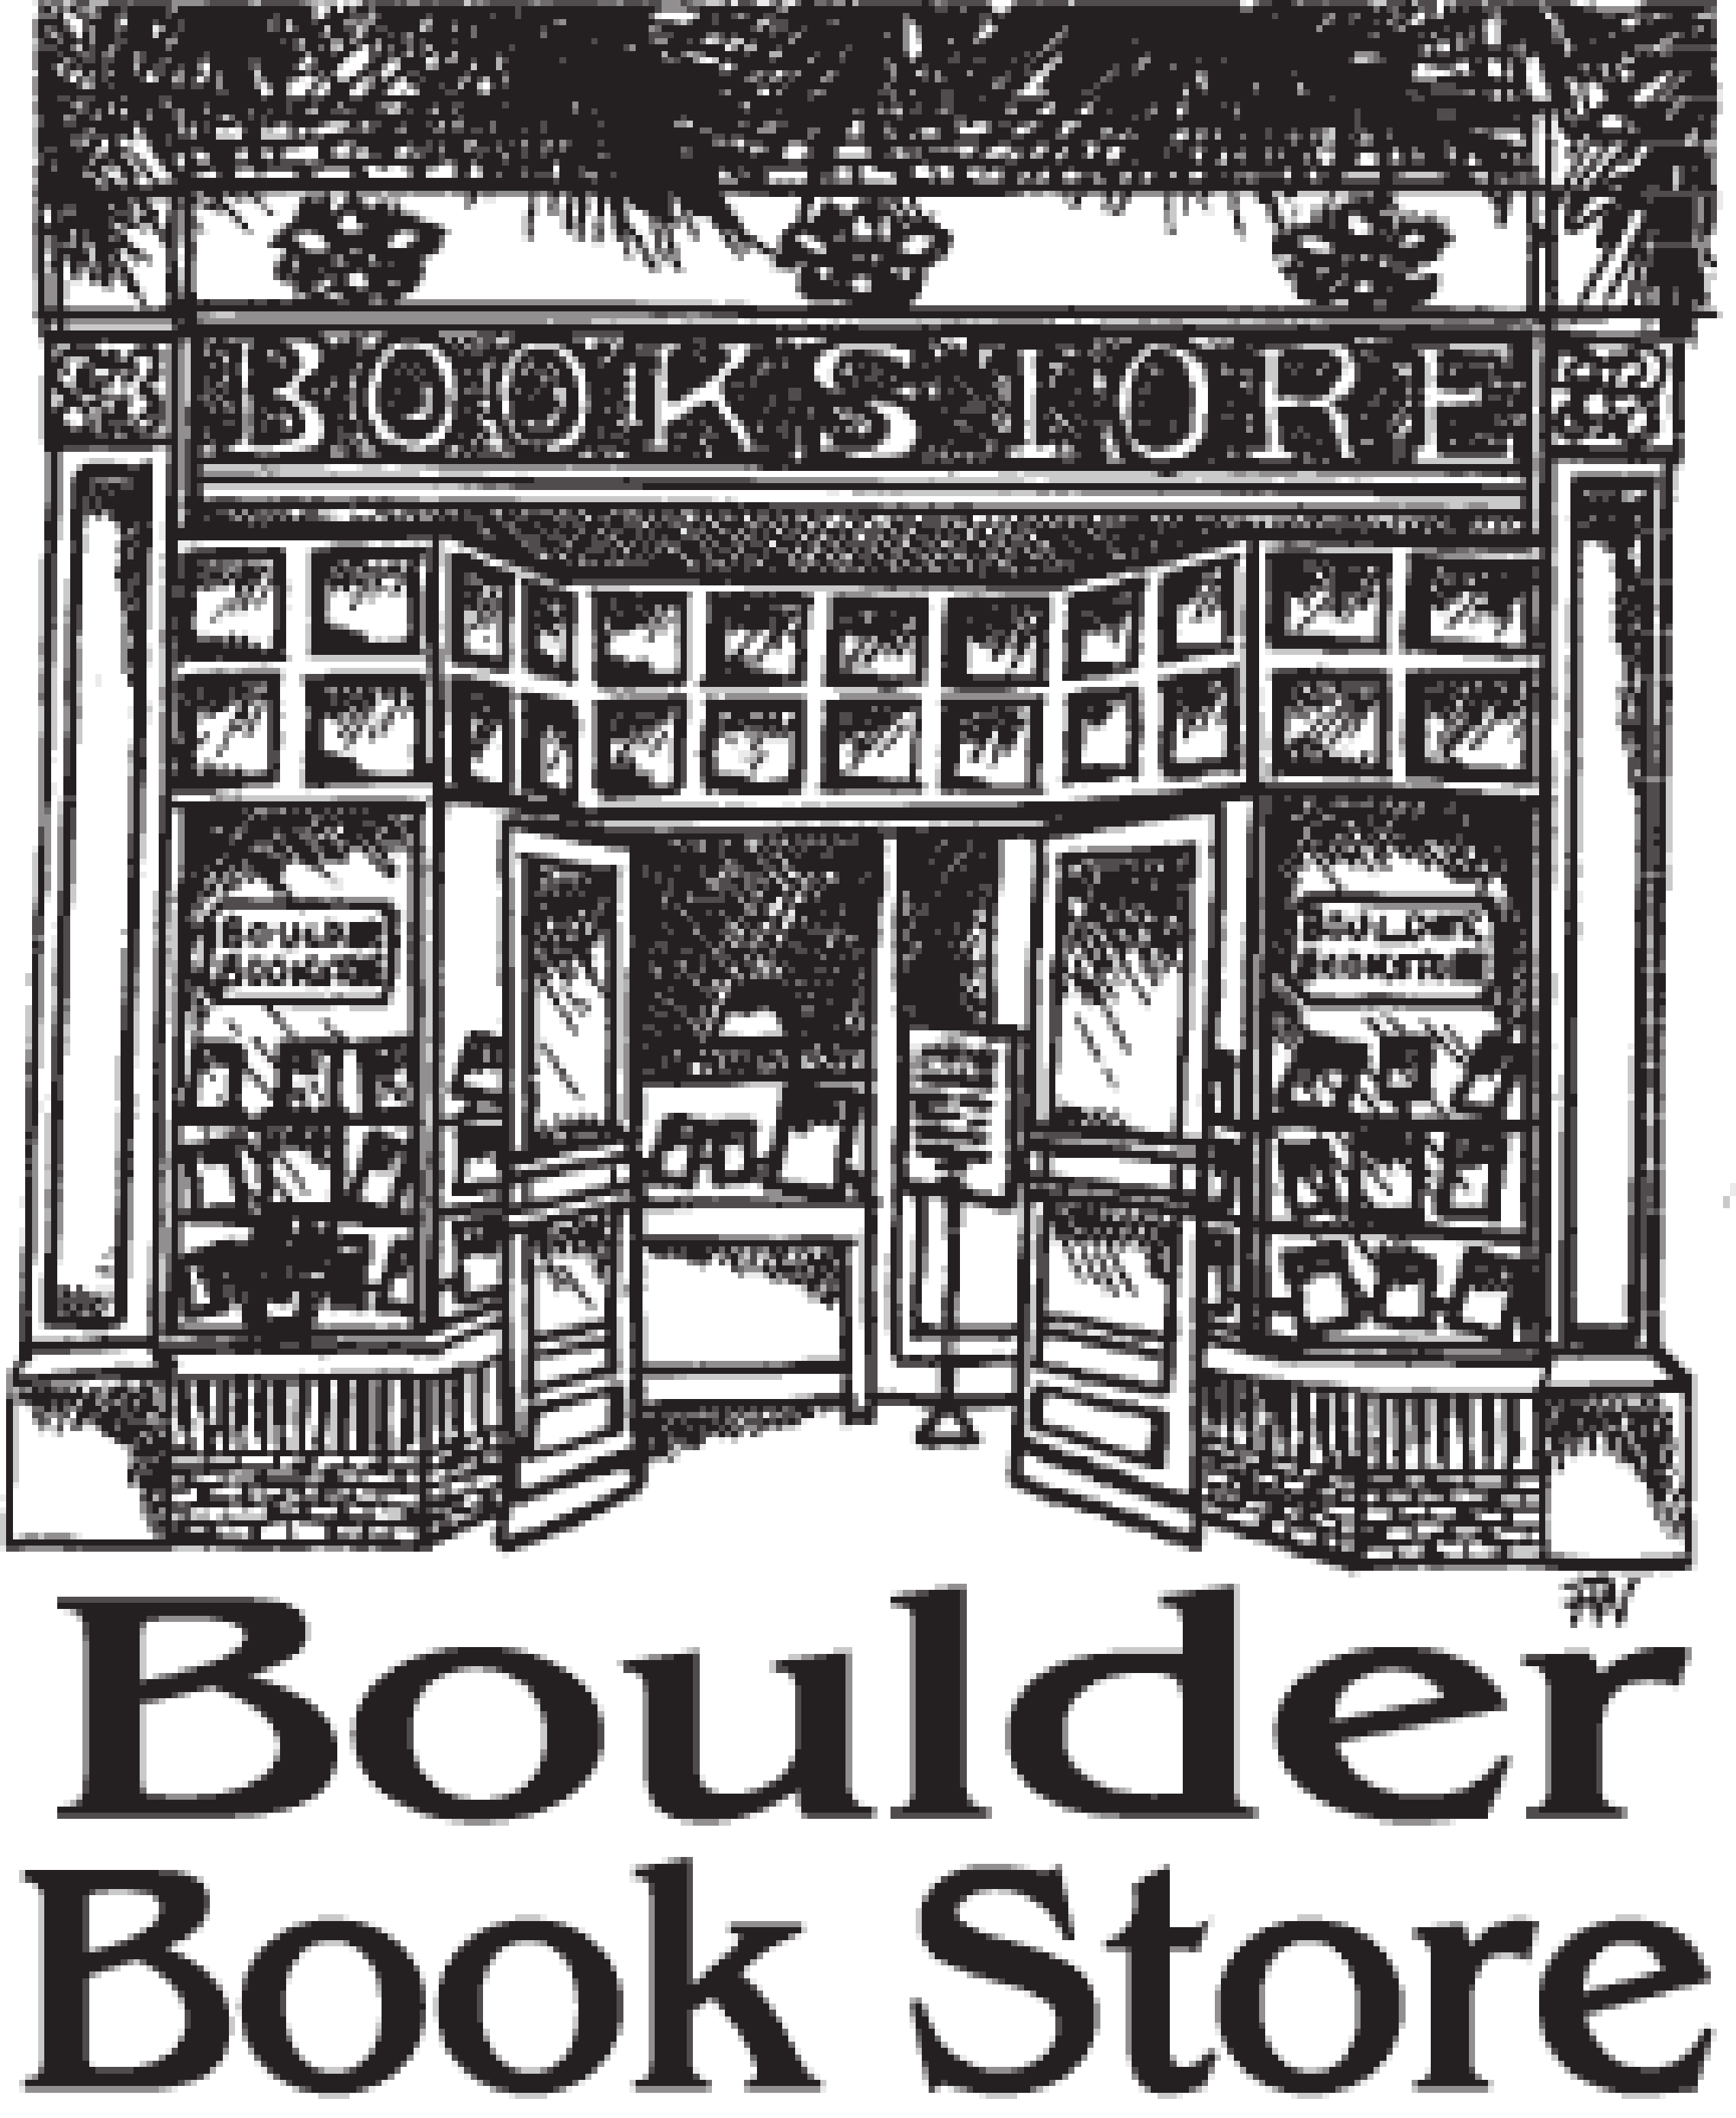 Boulder Bookstore logo